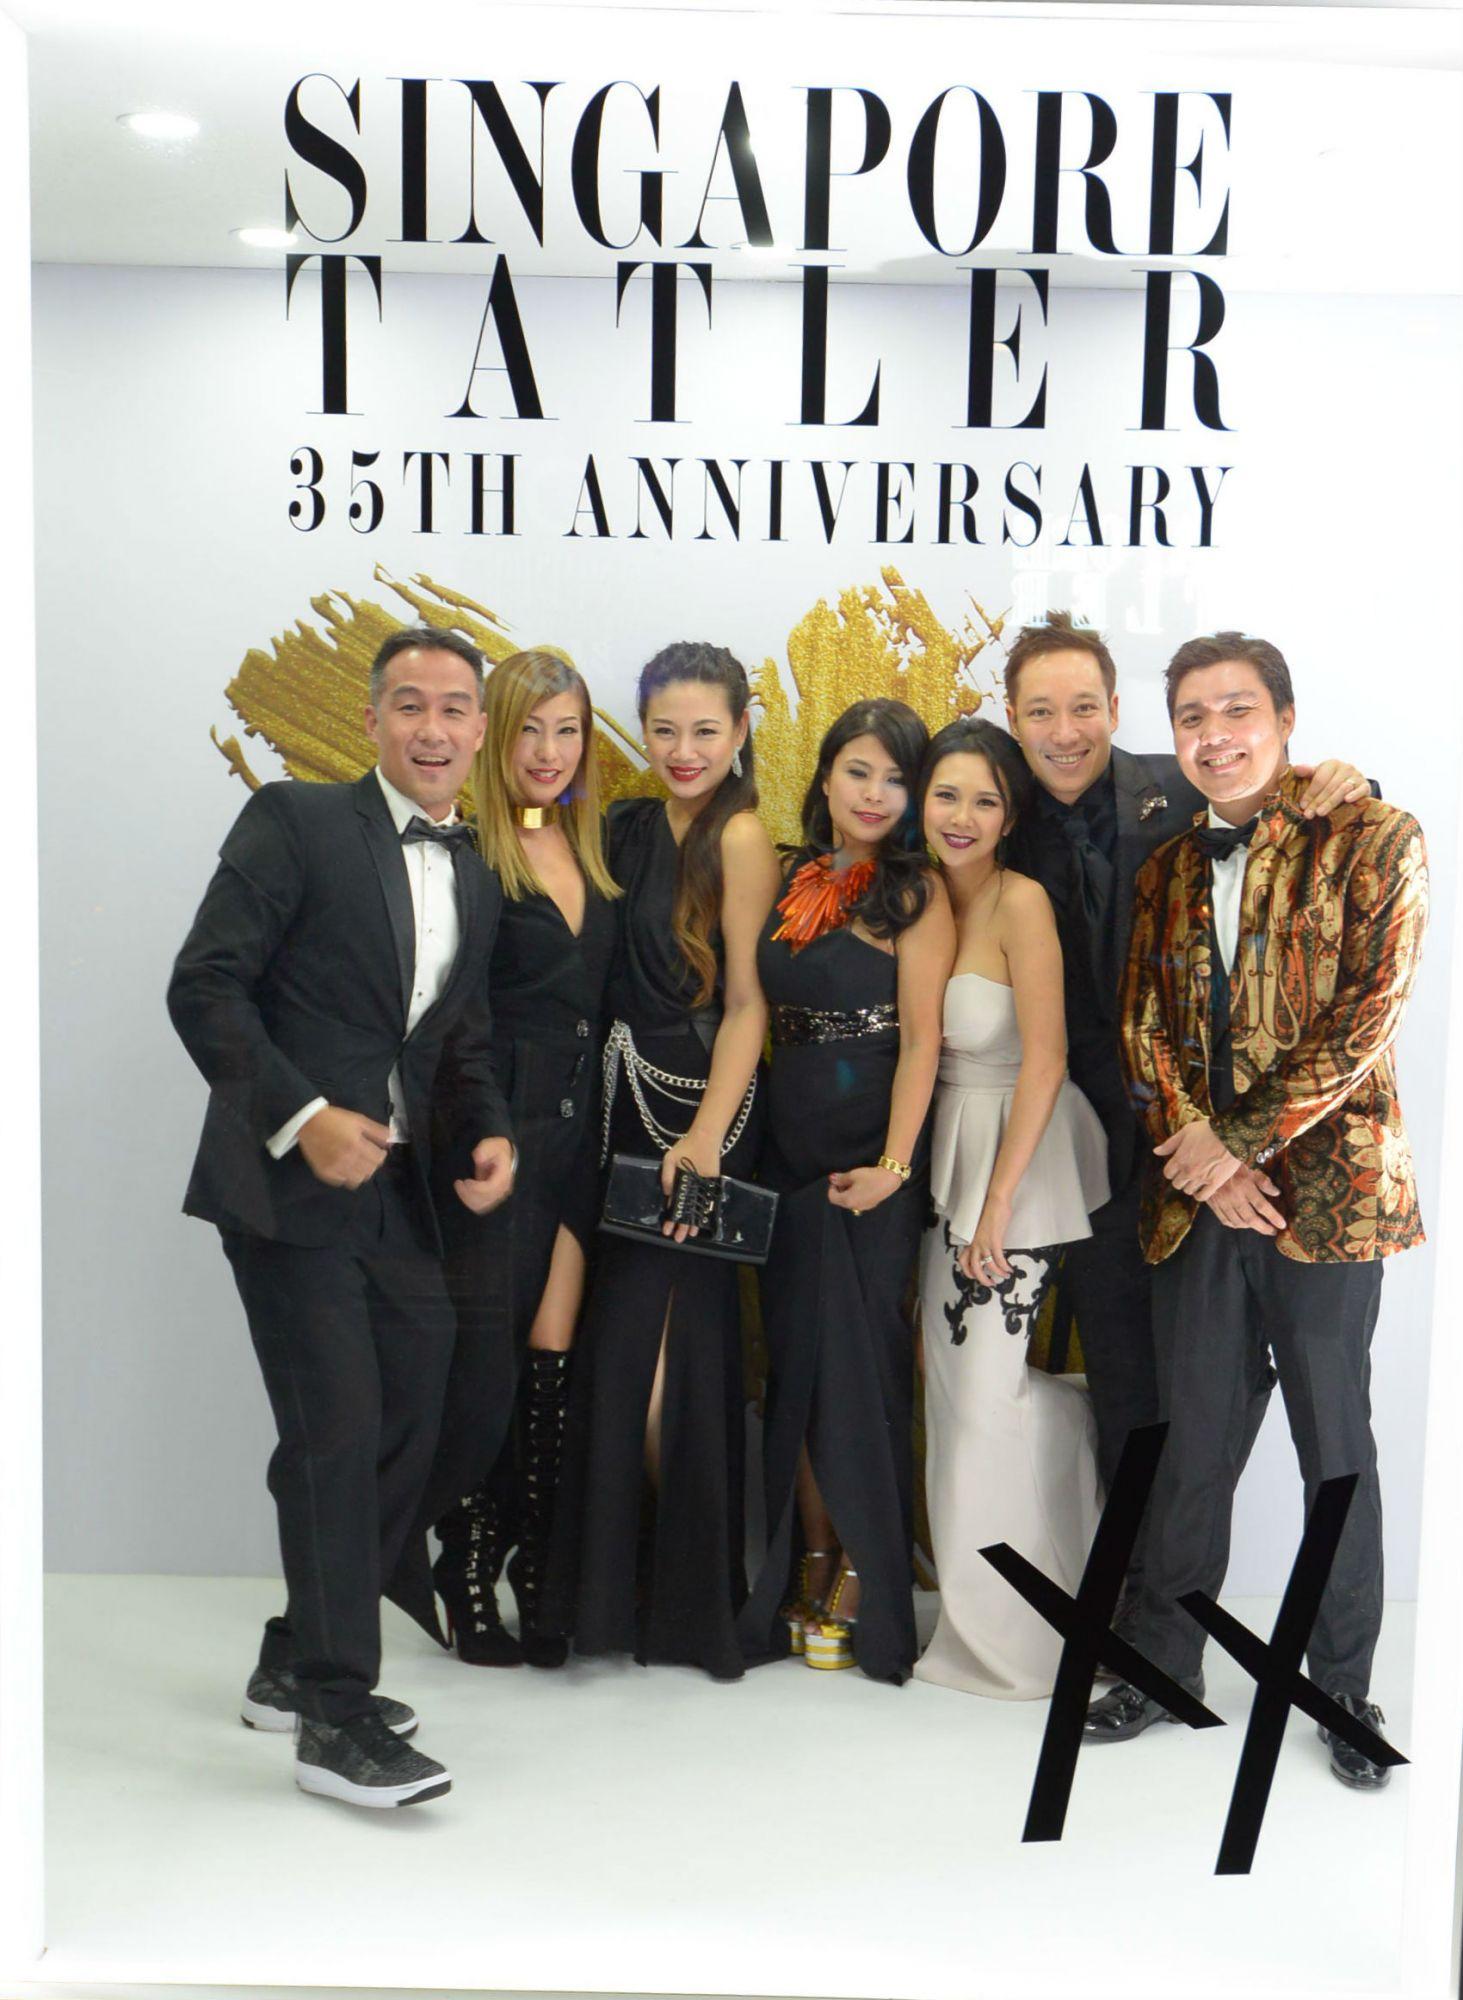 John Lim, Tan Min-Li, Tjin Lee, Marilyn Lum, Belinda Huber, Andre Huber, Shaun Tay